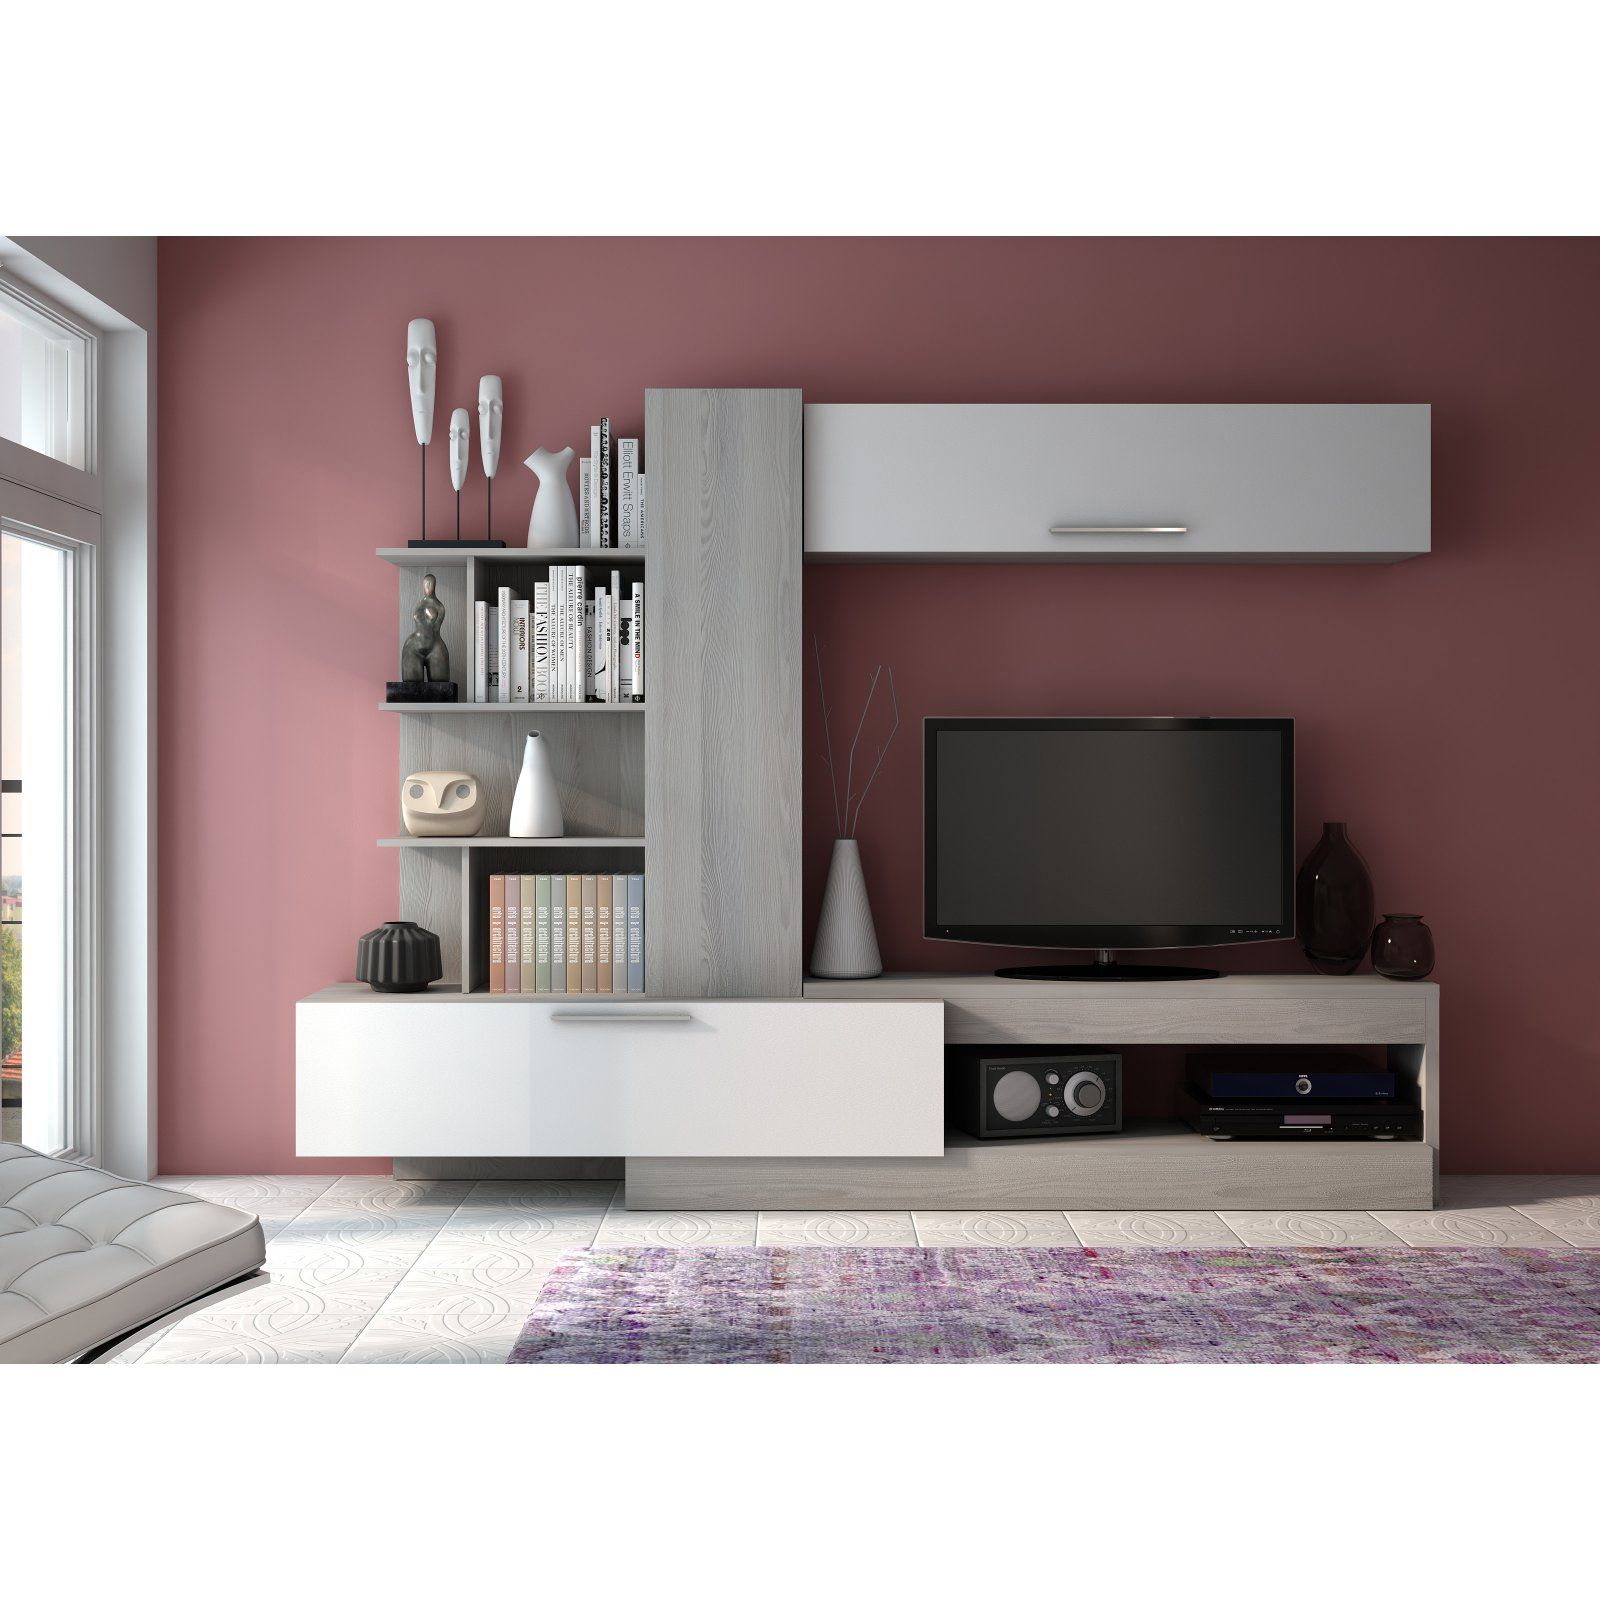 Trasman 4k Wall Unit Entertainment Center Muebles Para Tv